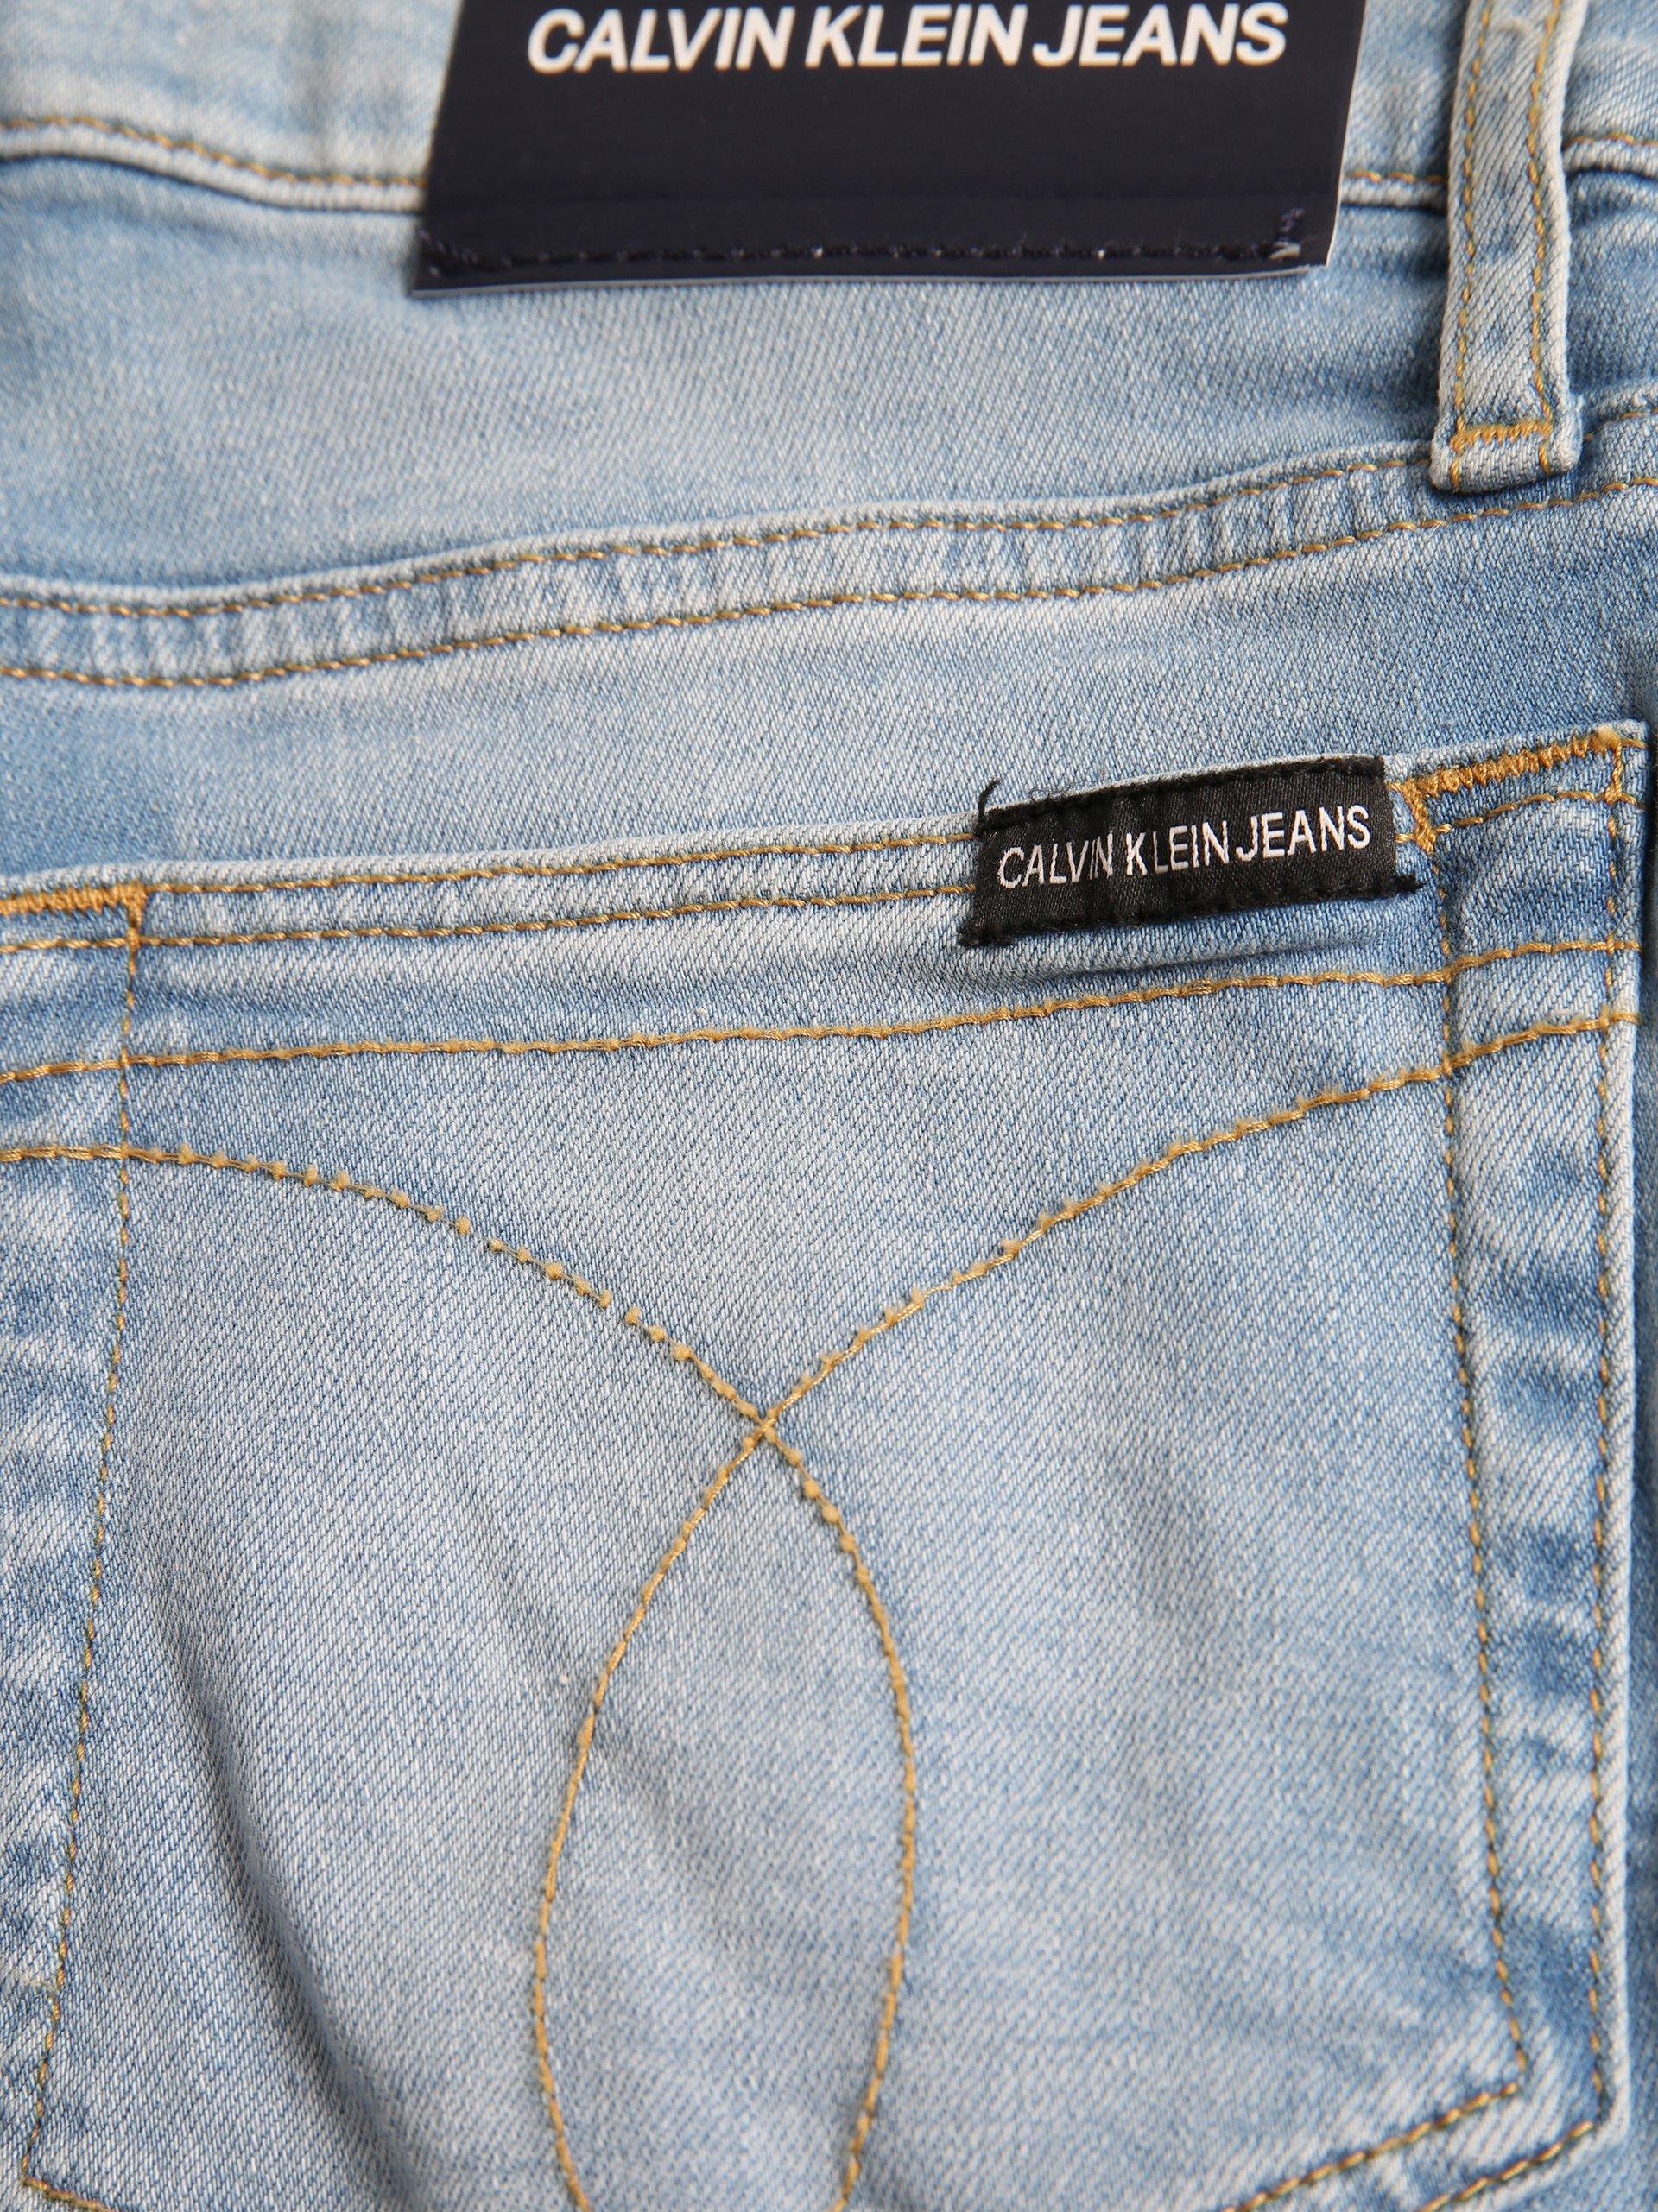 Calvin Klein Jeans Jungen Jeans Slim Fit